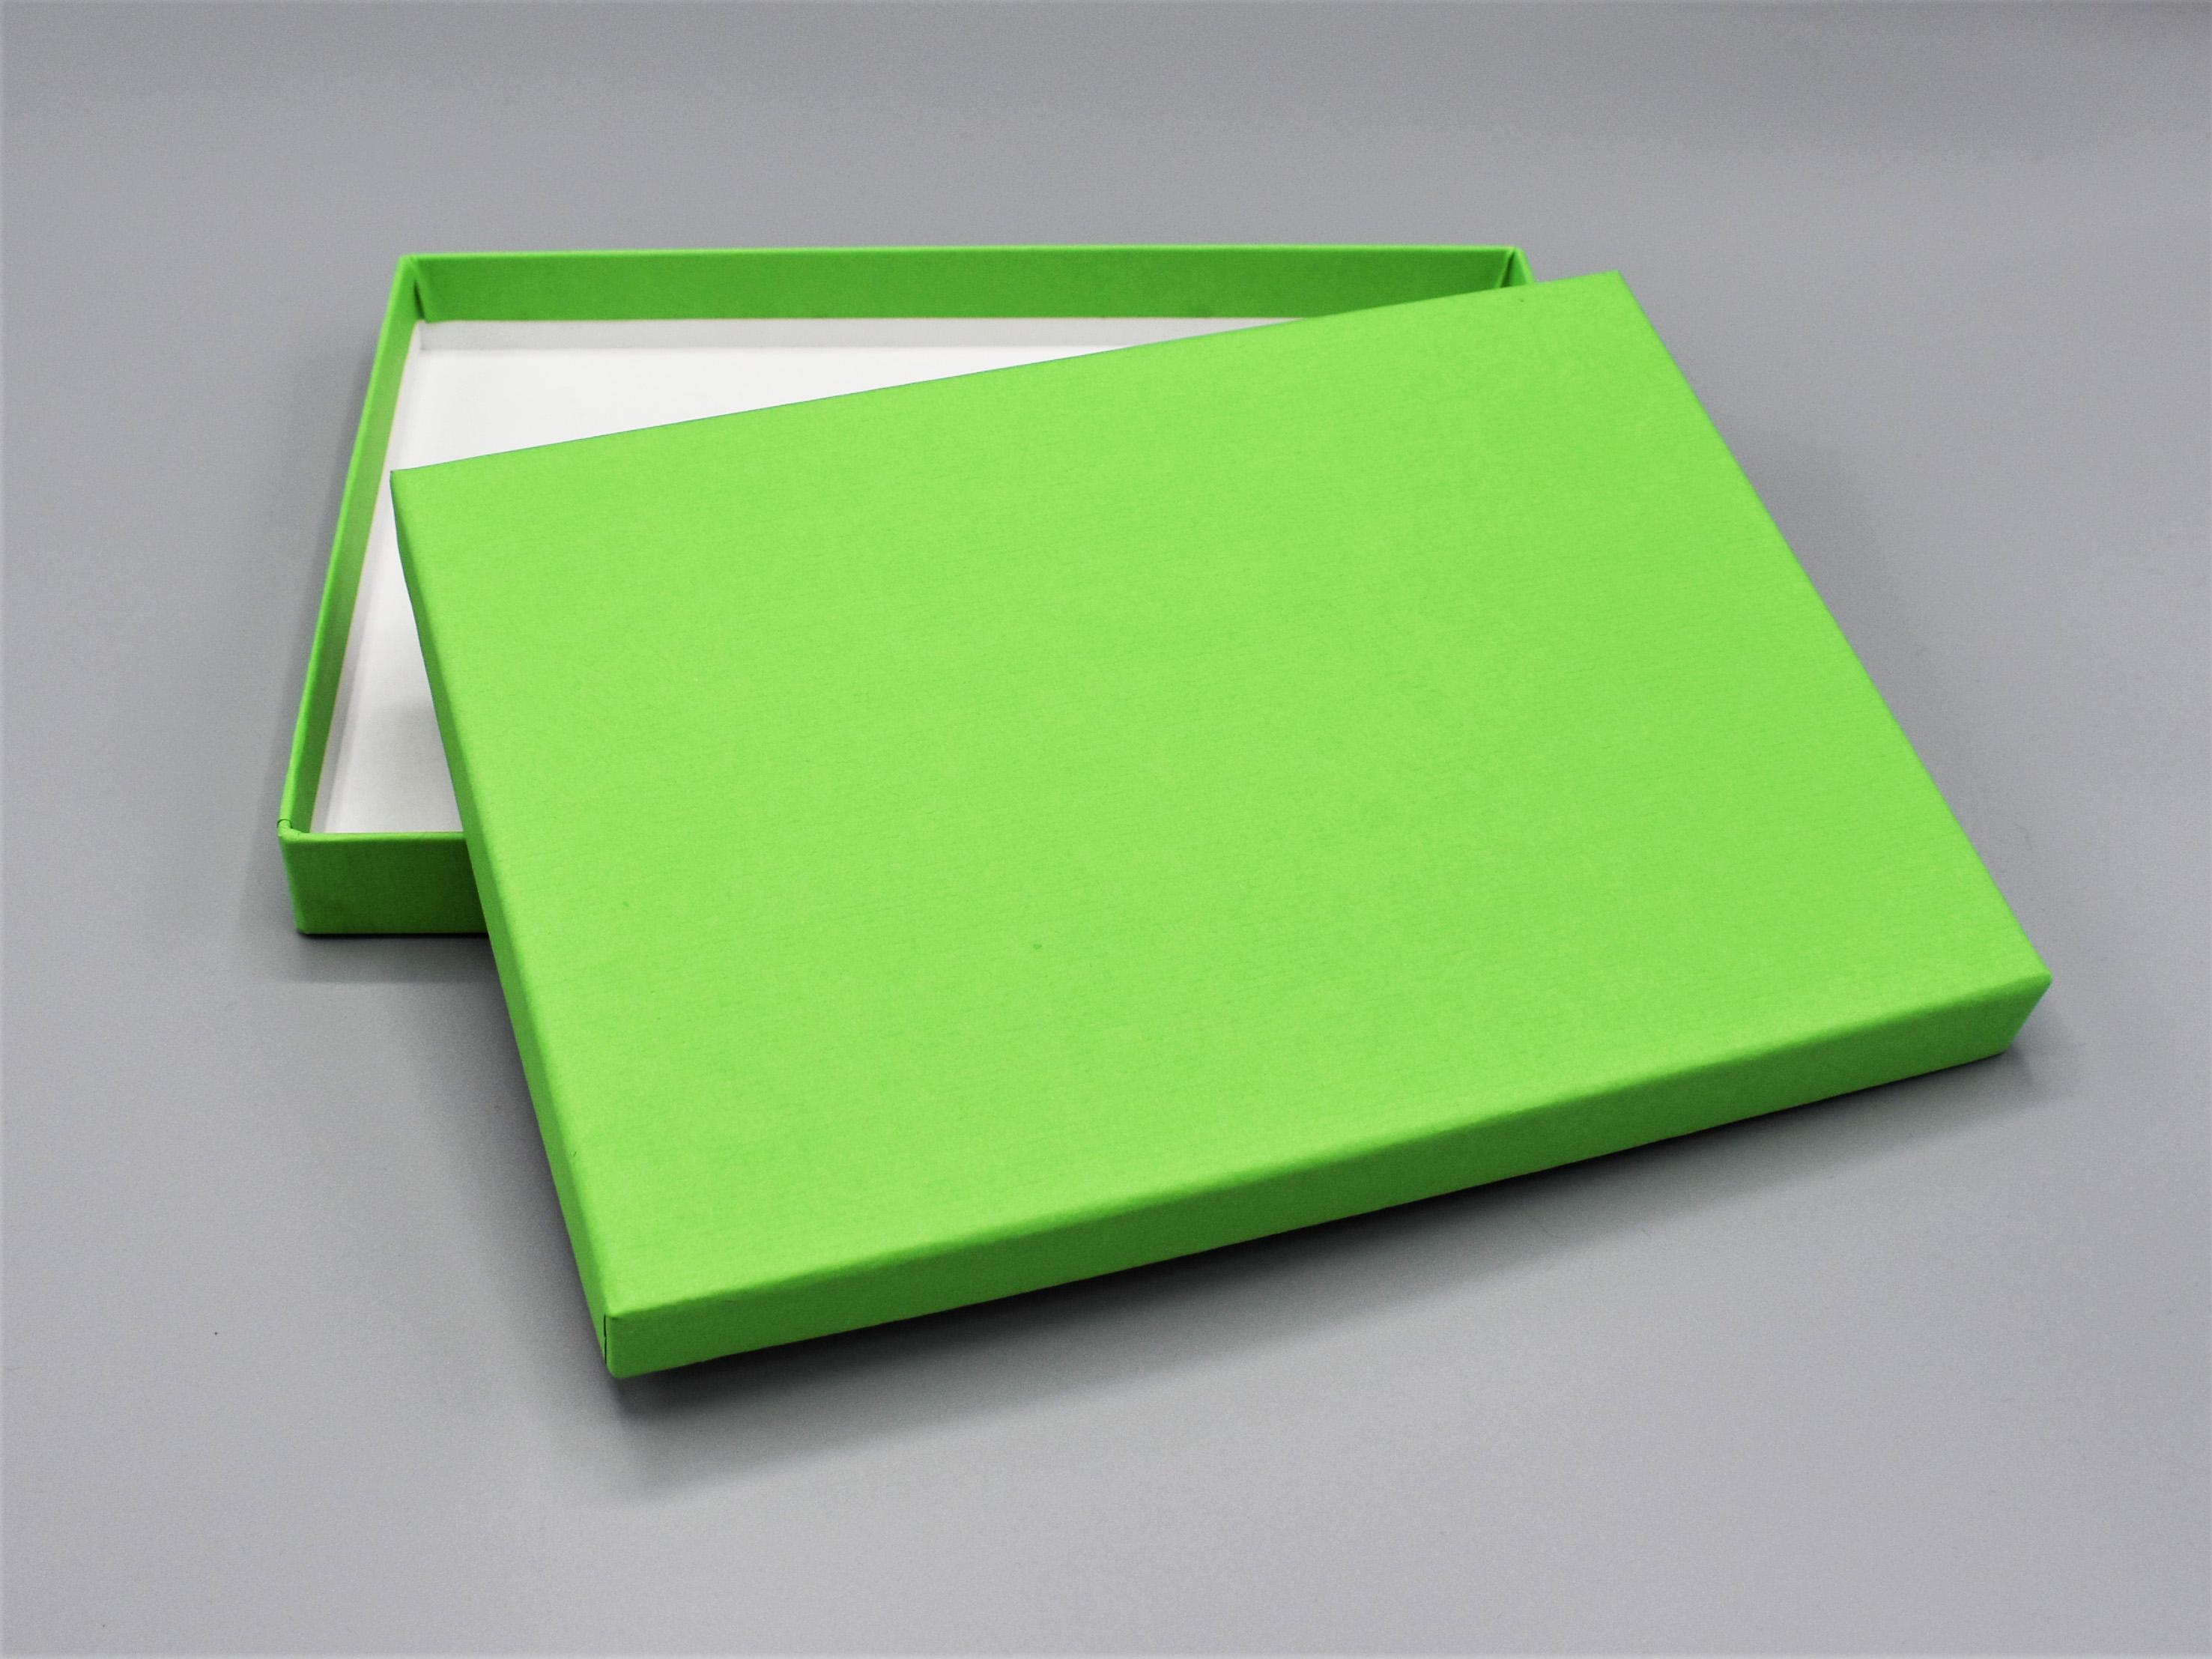 artoz-pure-box-maigr-n4xqjmlLpFm2Imh